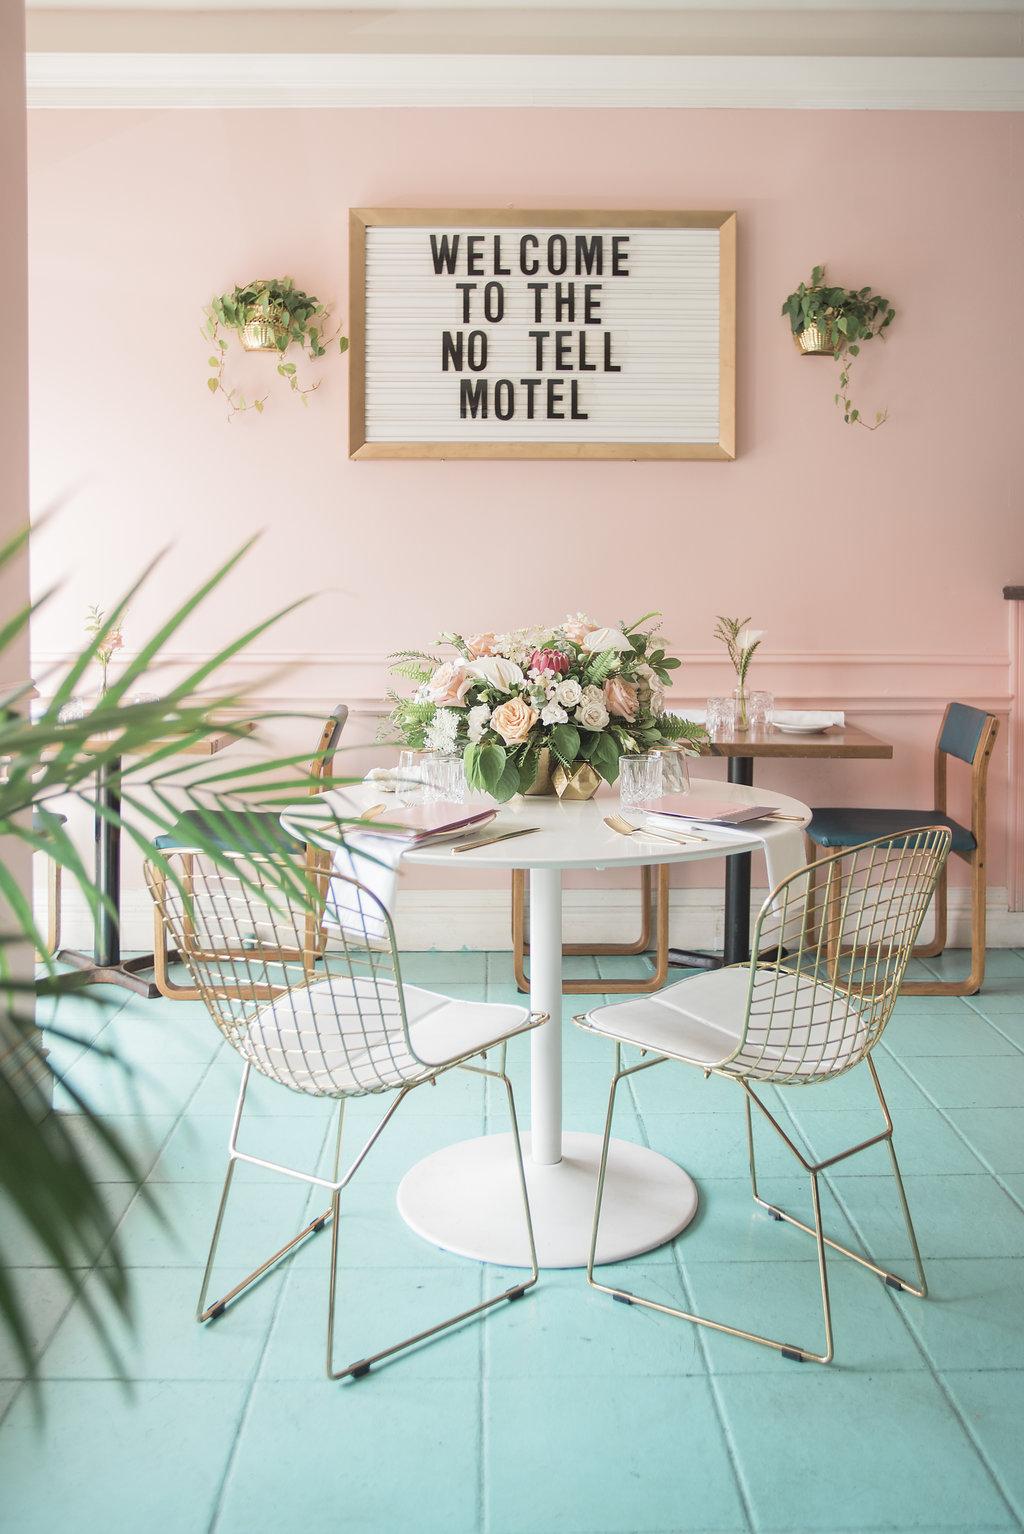 Motel-Restaurant-Editorial-Vineyard-Bride-photo-by-Blynda-DaCosta-Photography-012.JPG